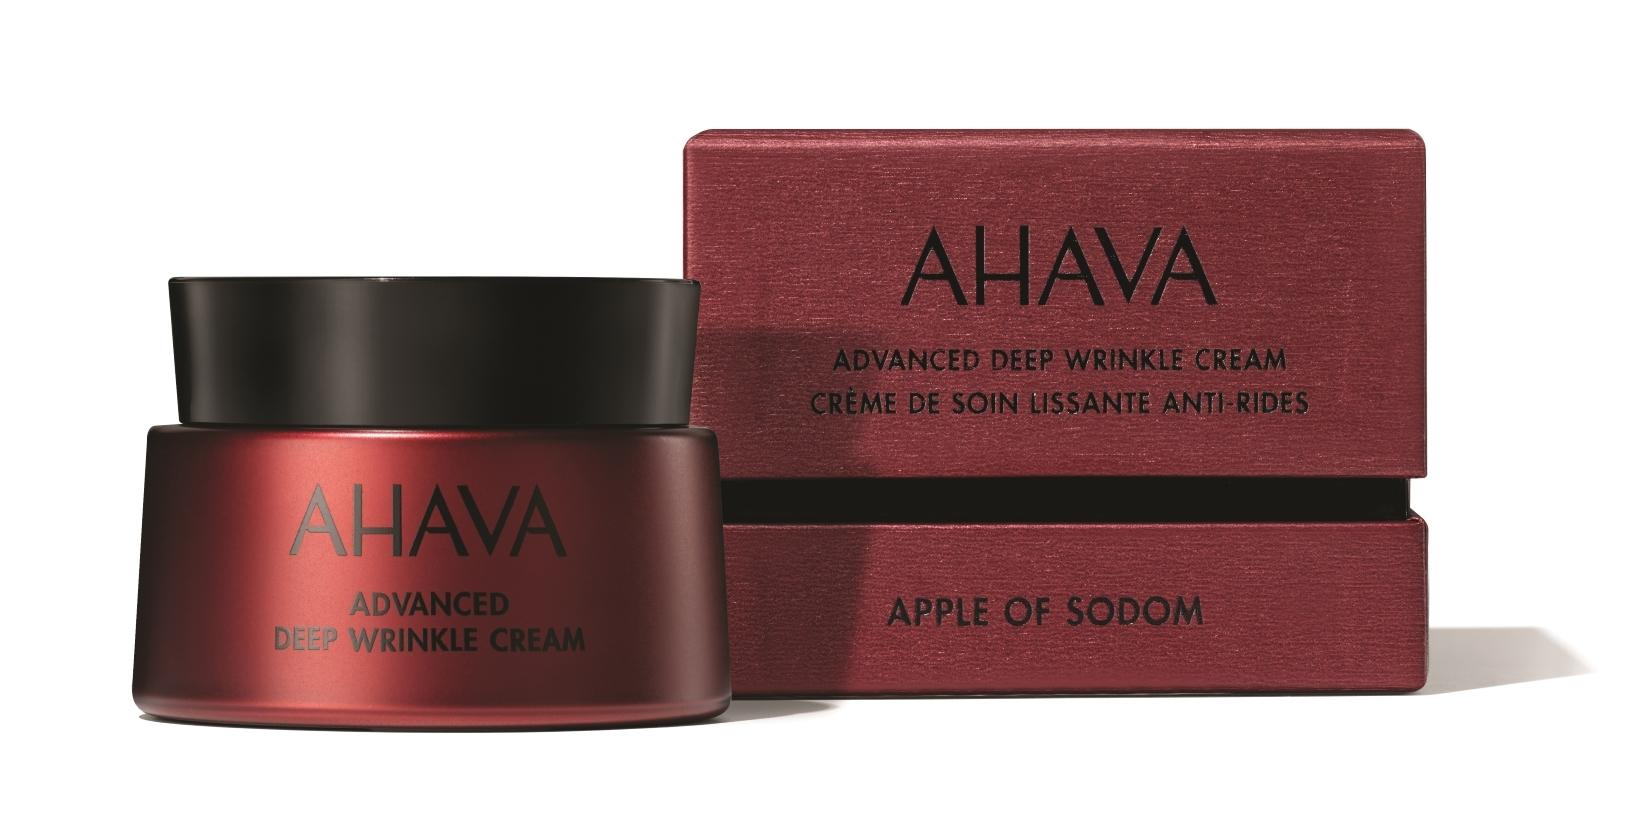 24-Hour Deep Wrinkle Cream de Ahava minimiza las arrugas y reafirma...